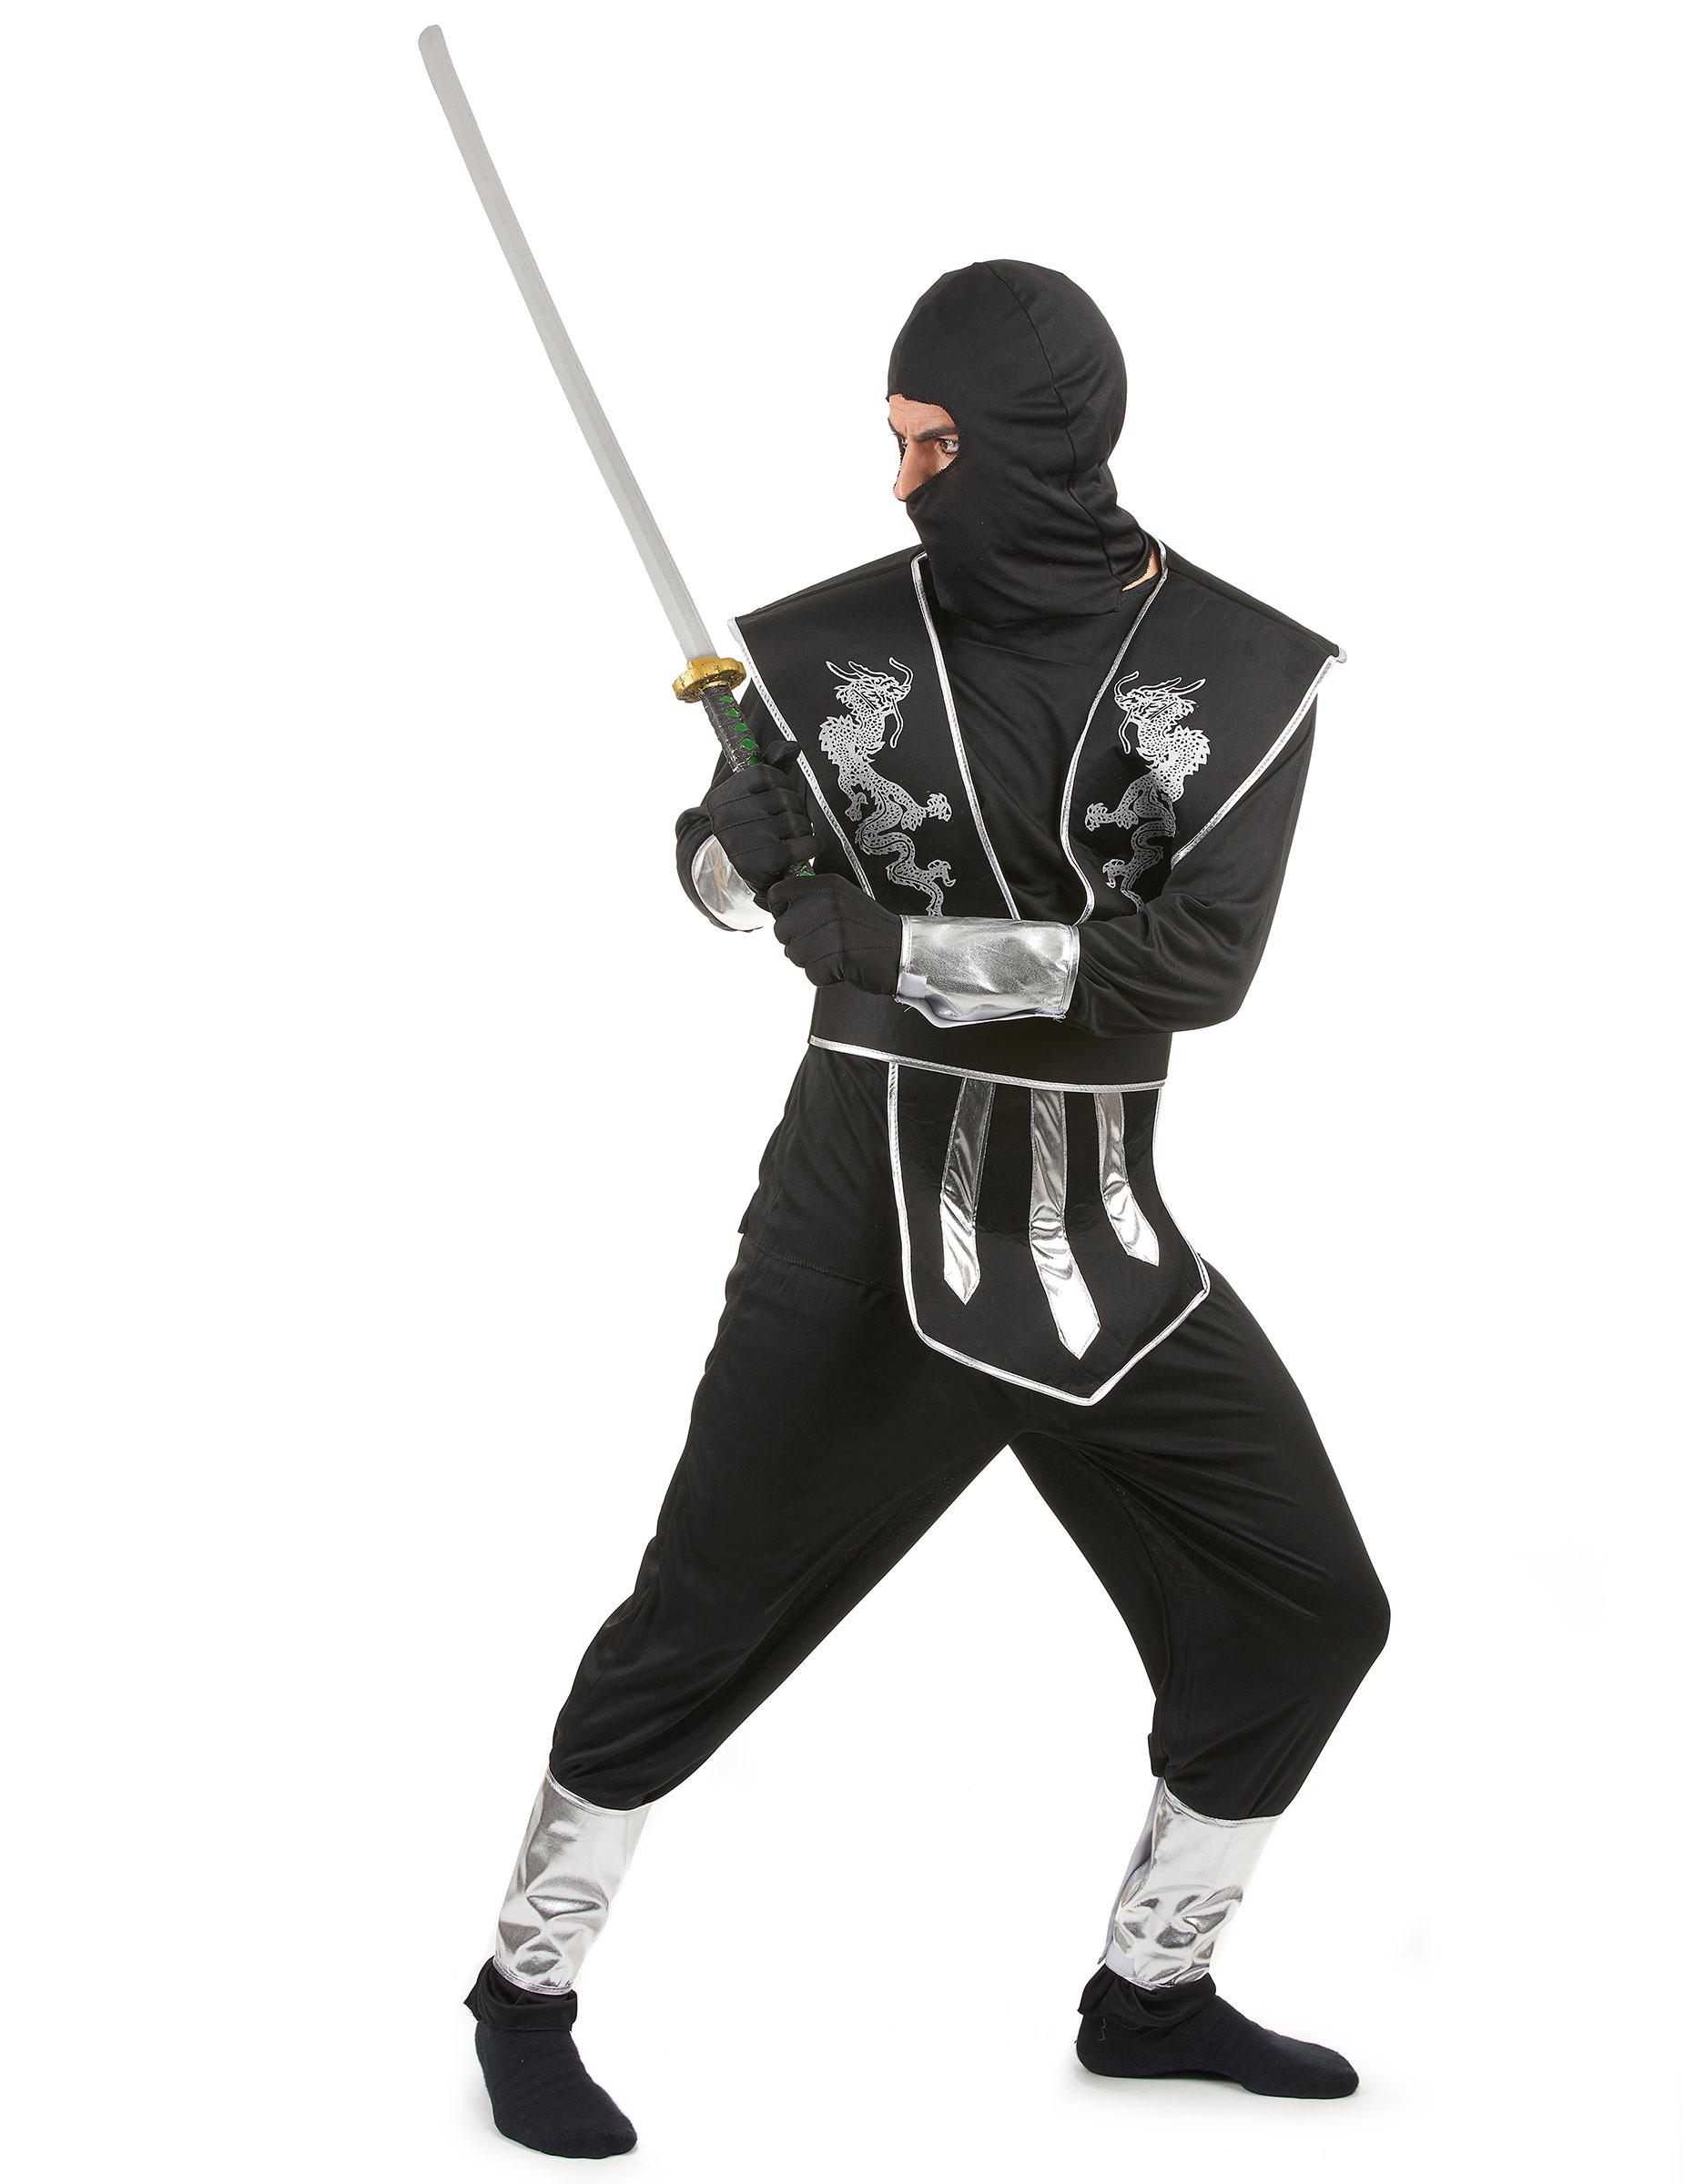 tolles ninjakost m f r m nner kost me f r erwachsene und. Black Bedroom Furniture Sets. Home Design Ideas